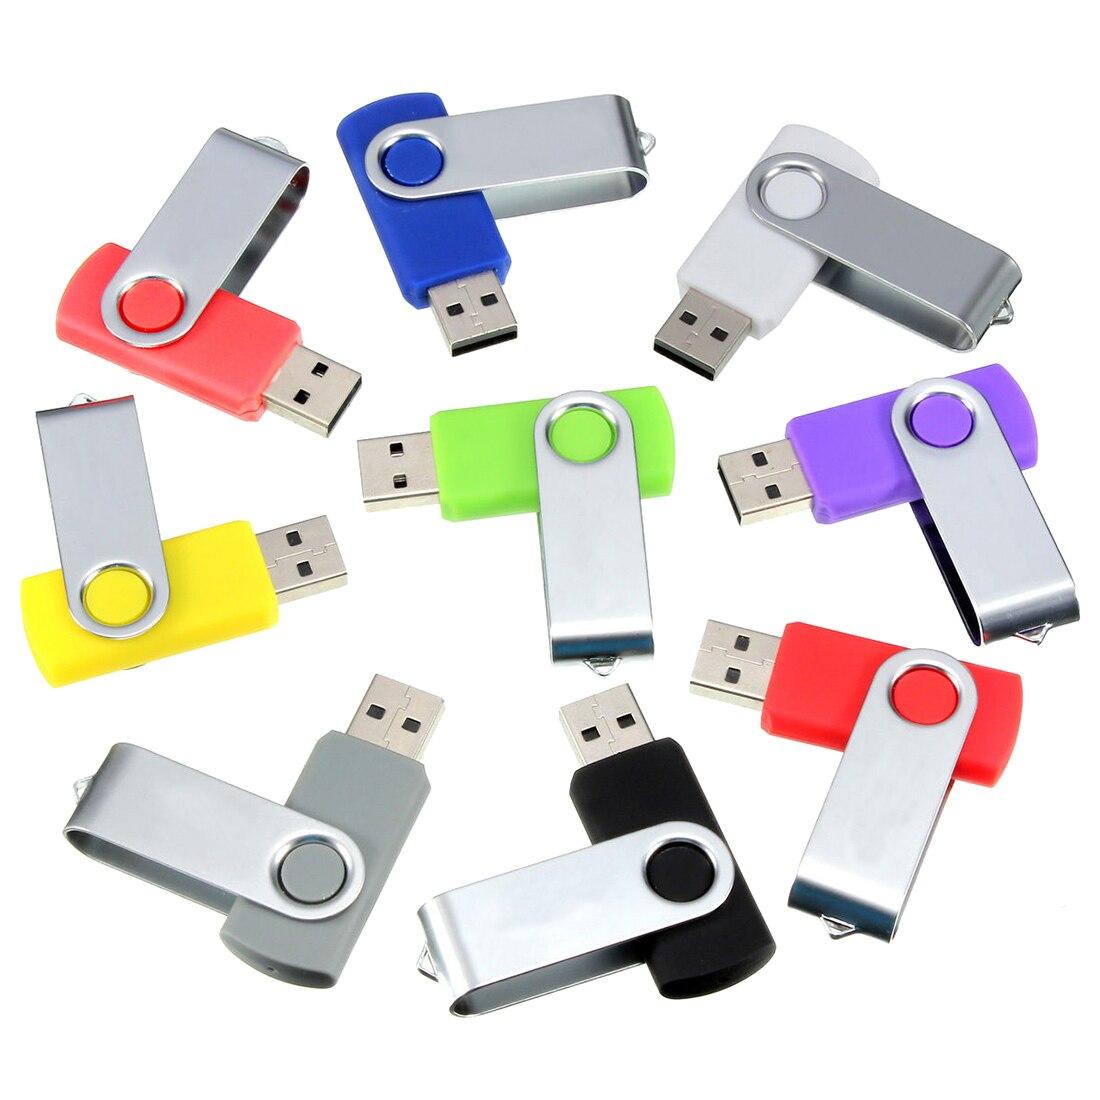 2GB-Swivel-USB-2-0-Flash-Memory-Thumb-Stick-Storage-Drive-Pen-Drive